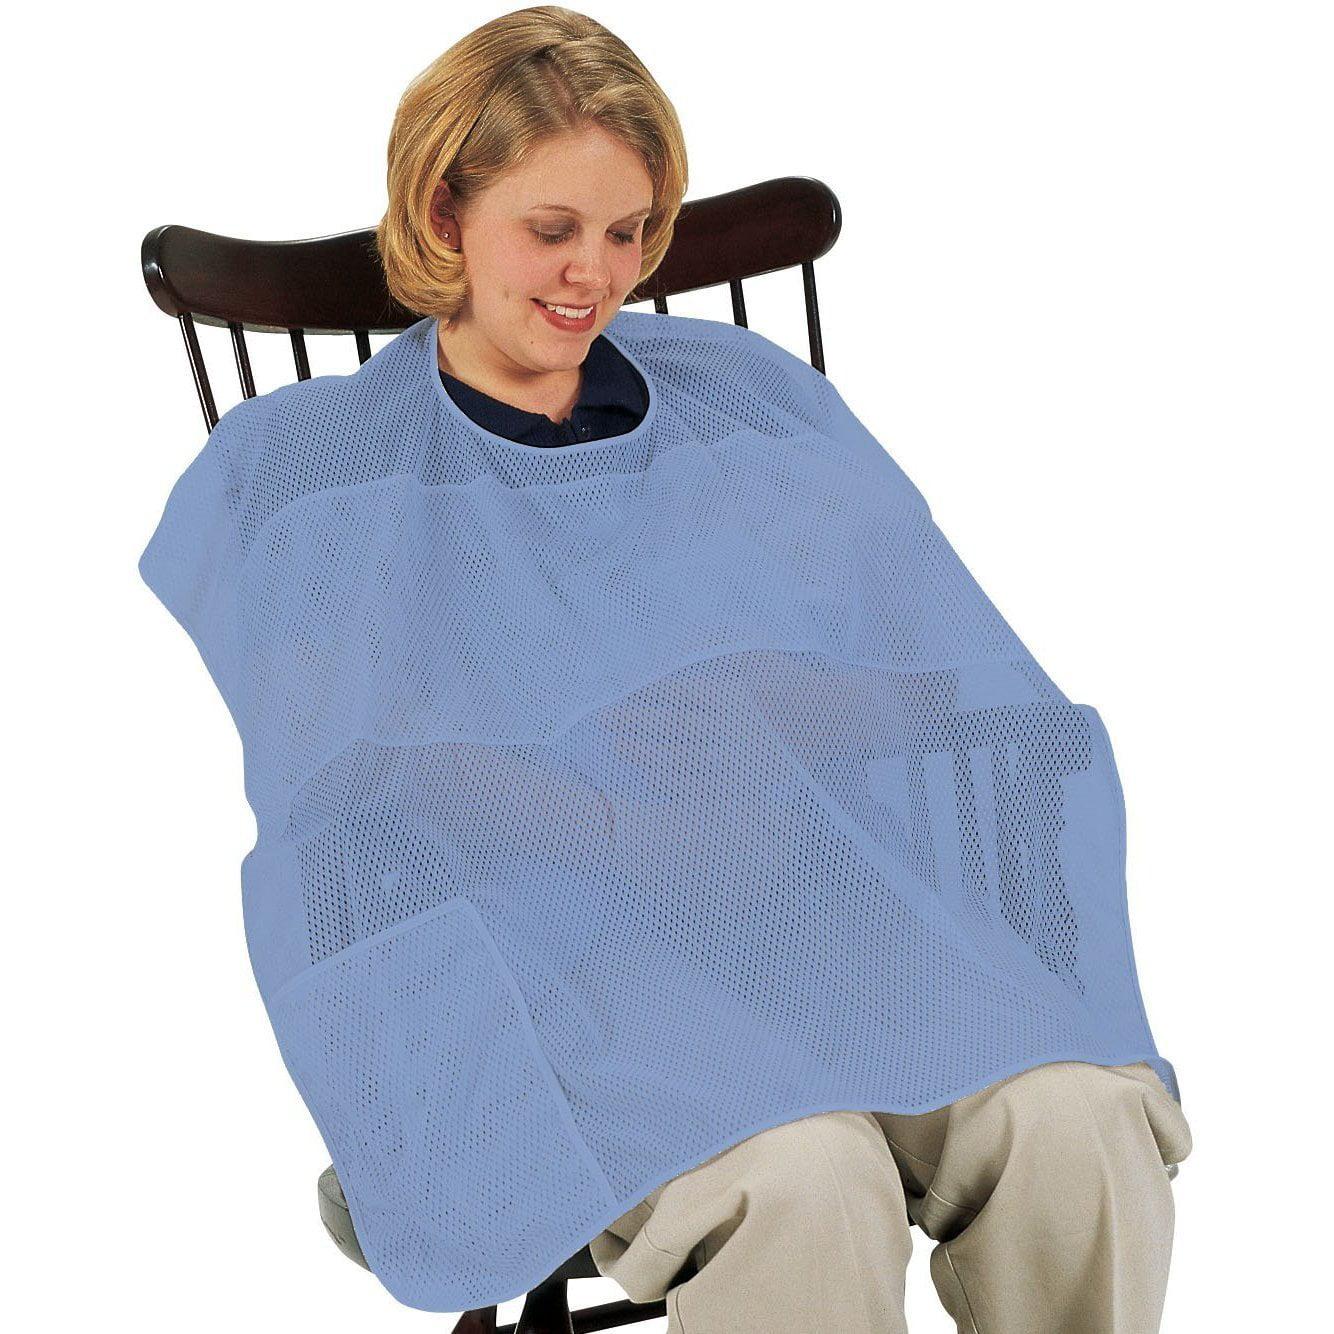 Leachco Cover n Cool Breastfeeding Cover - Periwinkle